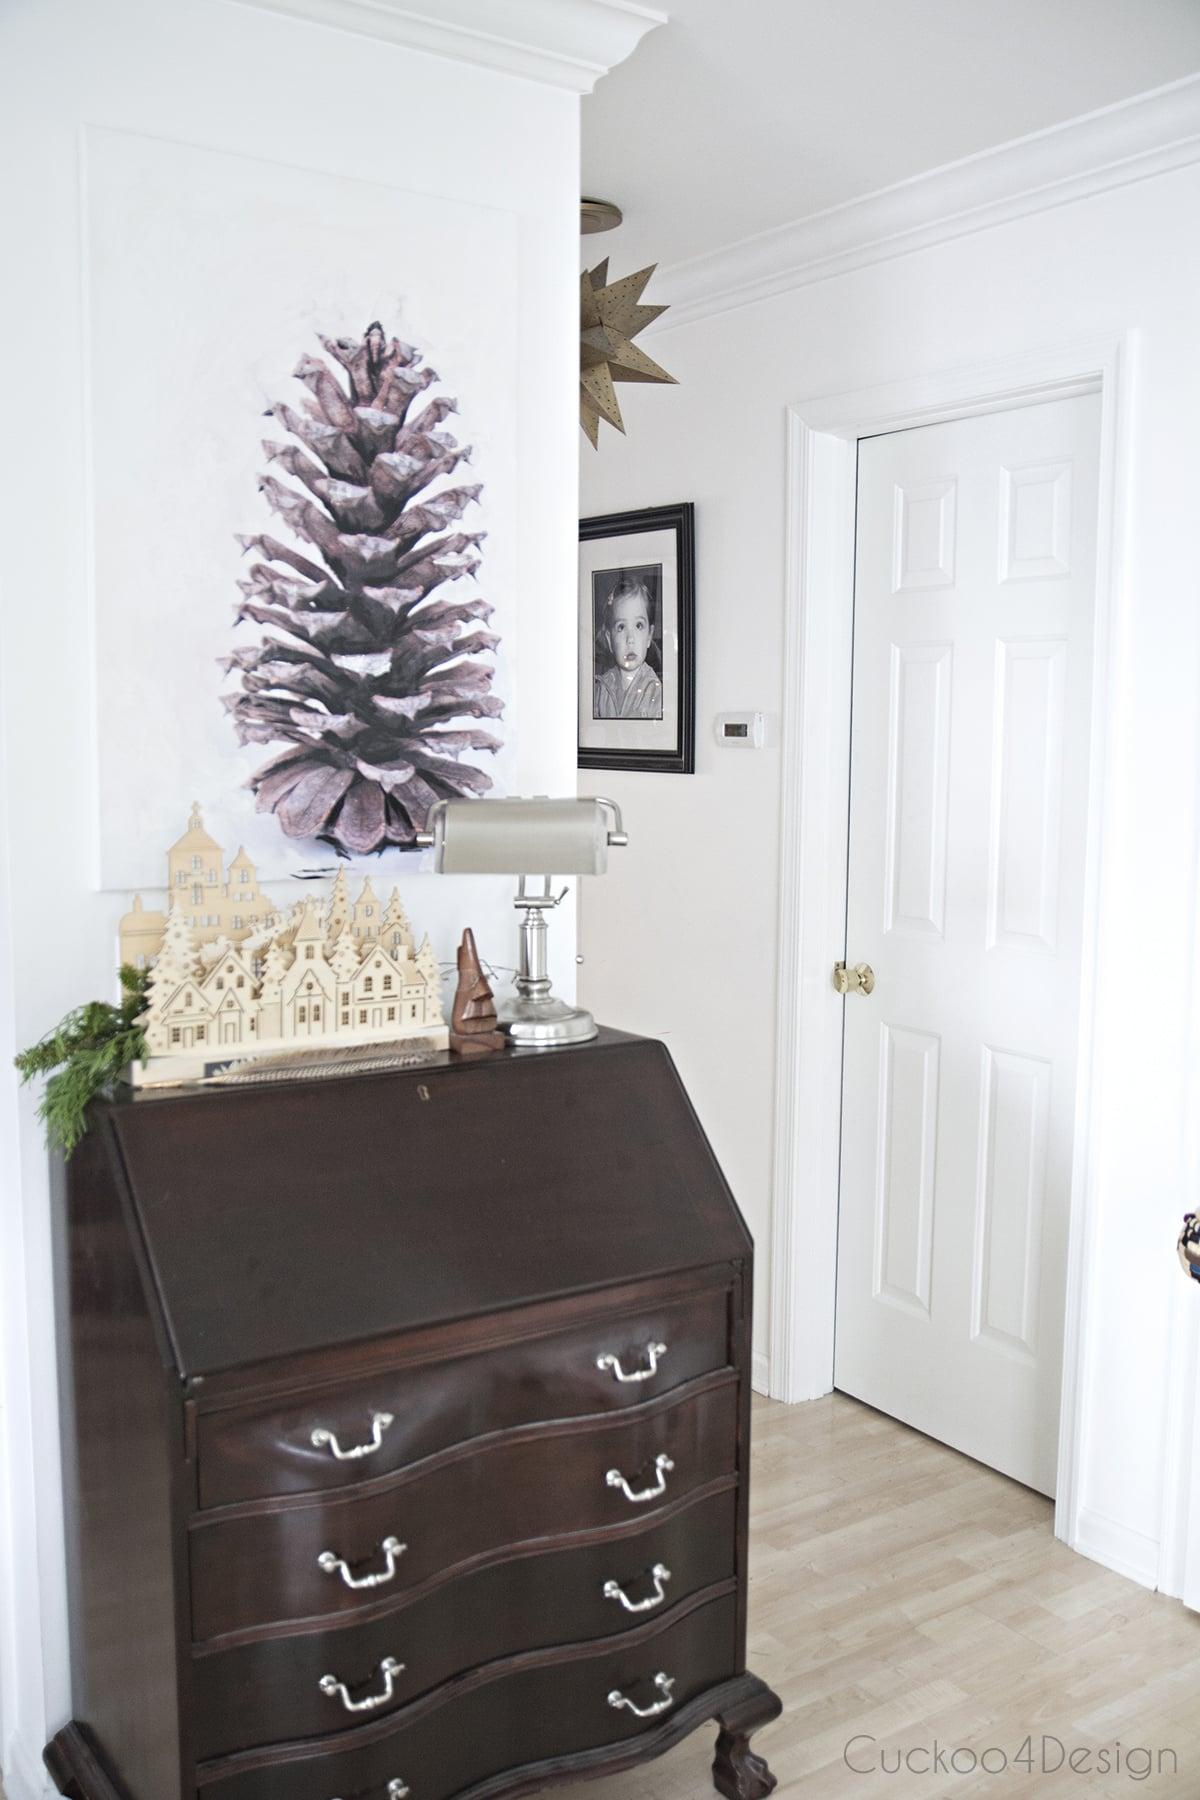 DIY pinecone Christmas artwork